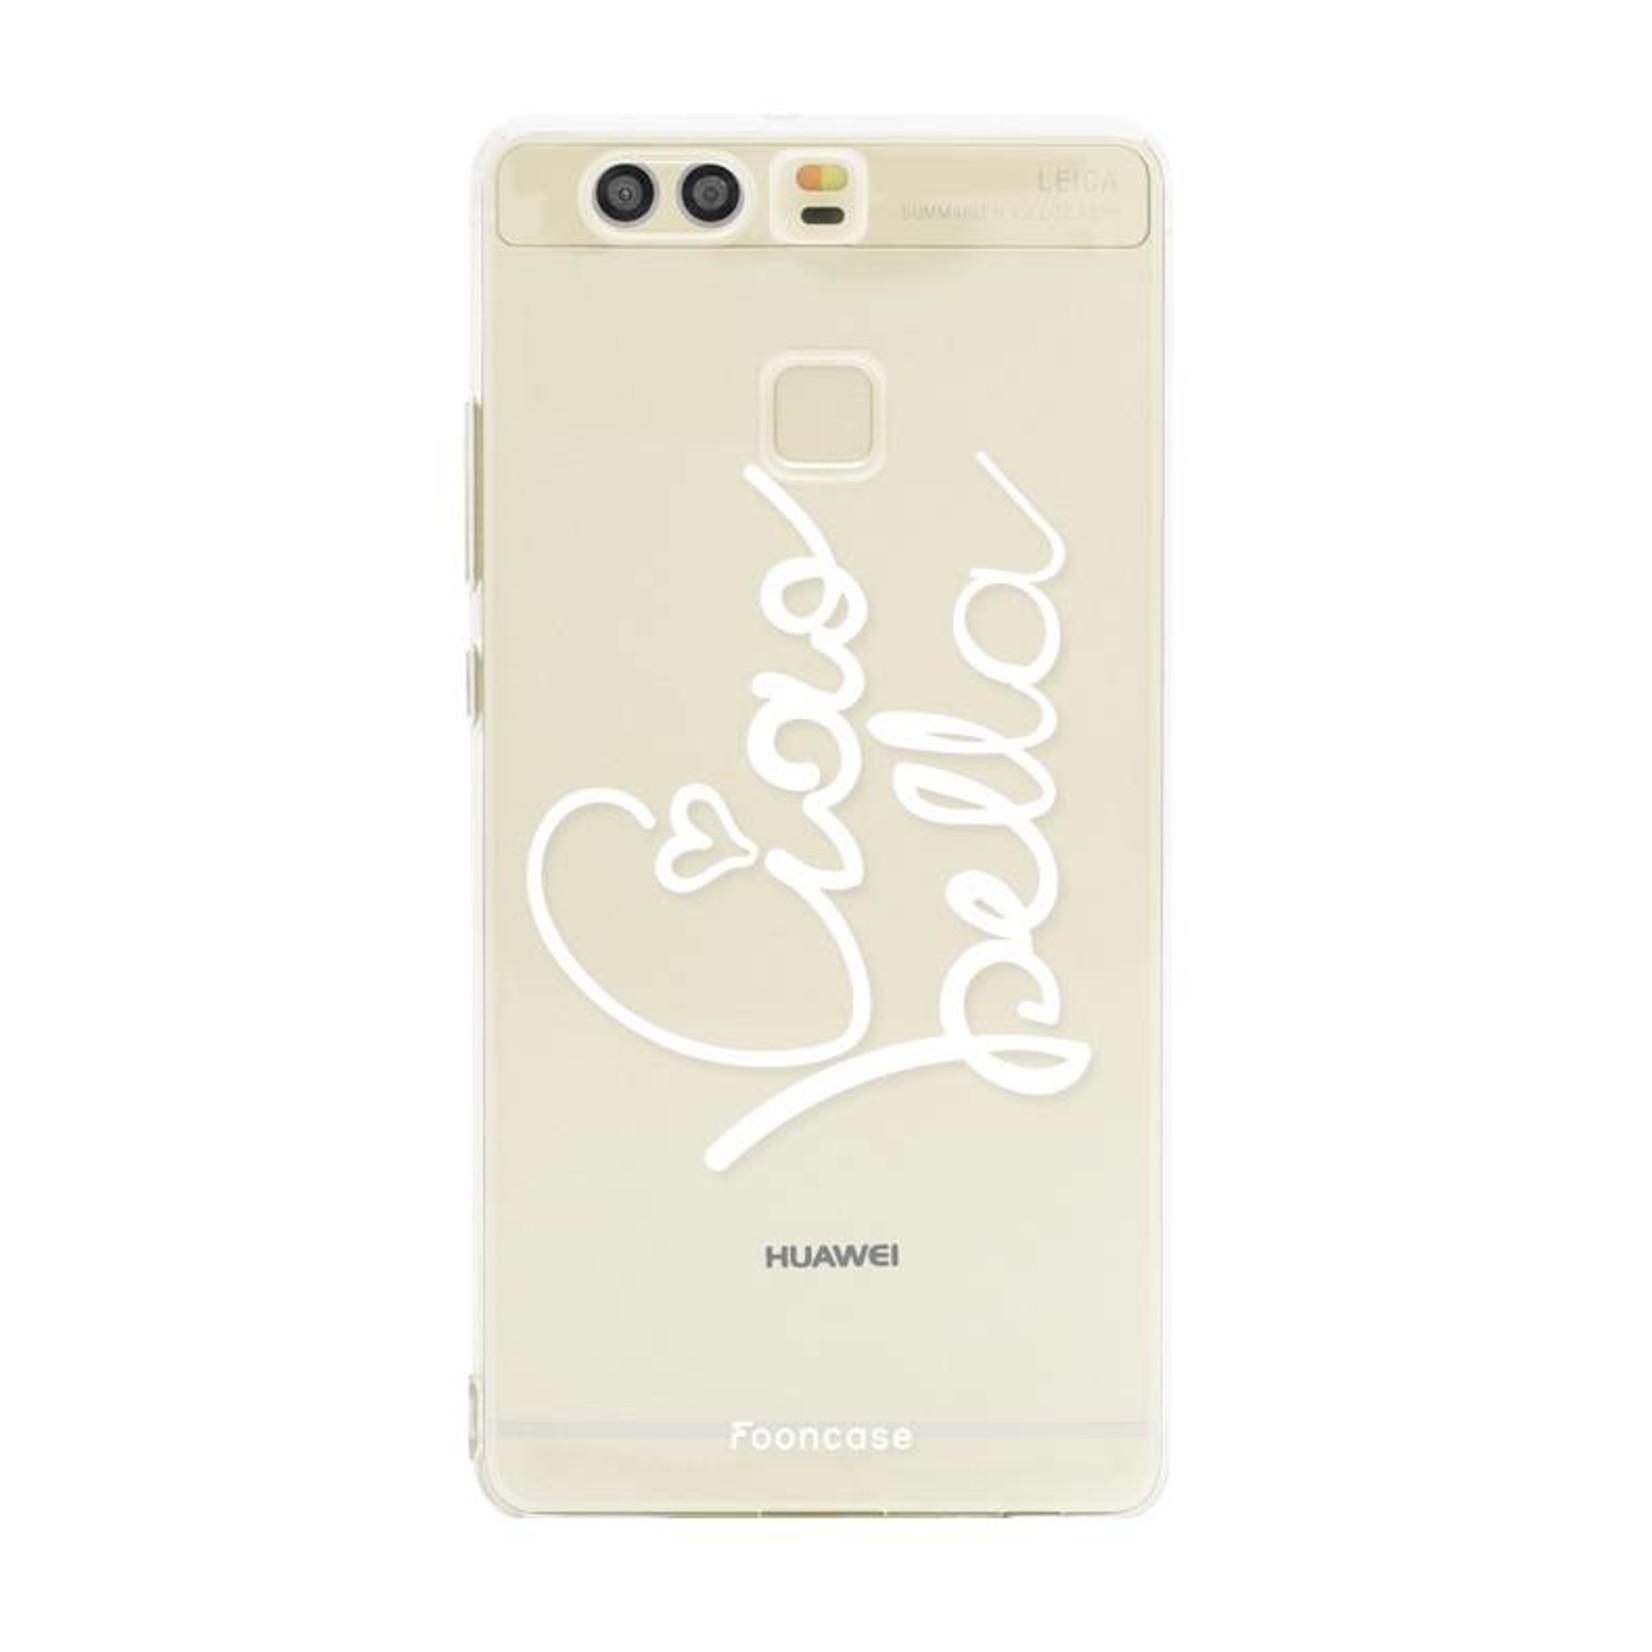 FOONCASE Huawei P9 Handyhülle - Ciao Bella!